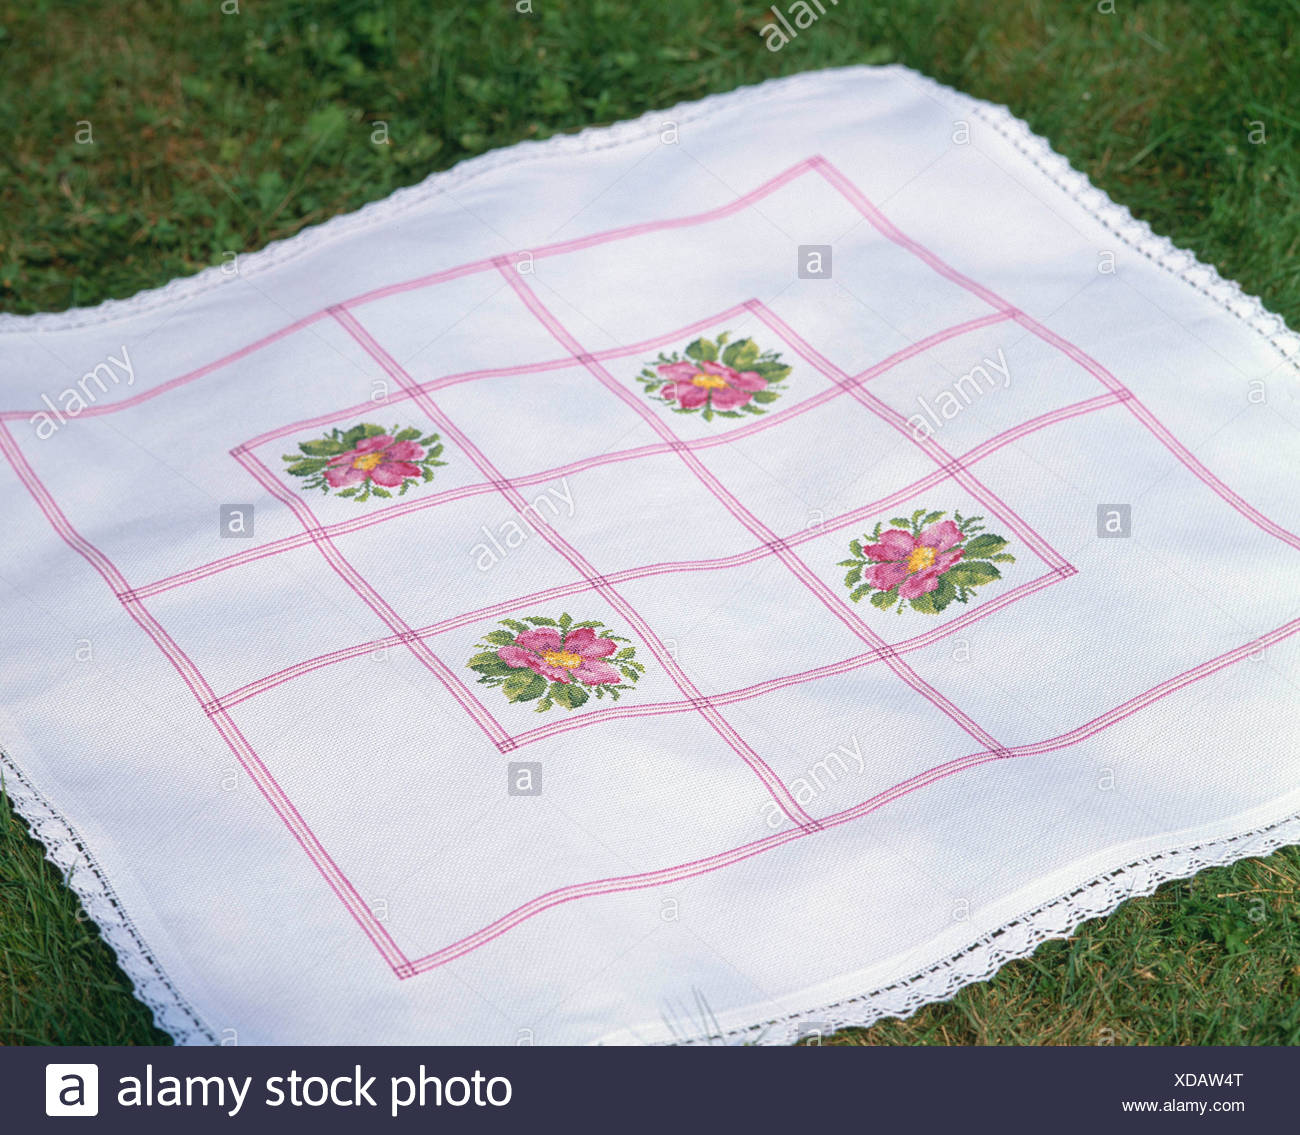 Embroidered Square Imágenes De Stock & Embroidered Square Fotos De ...